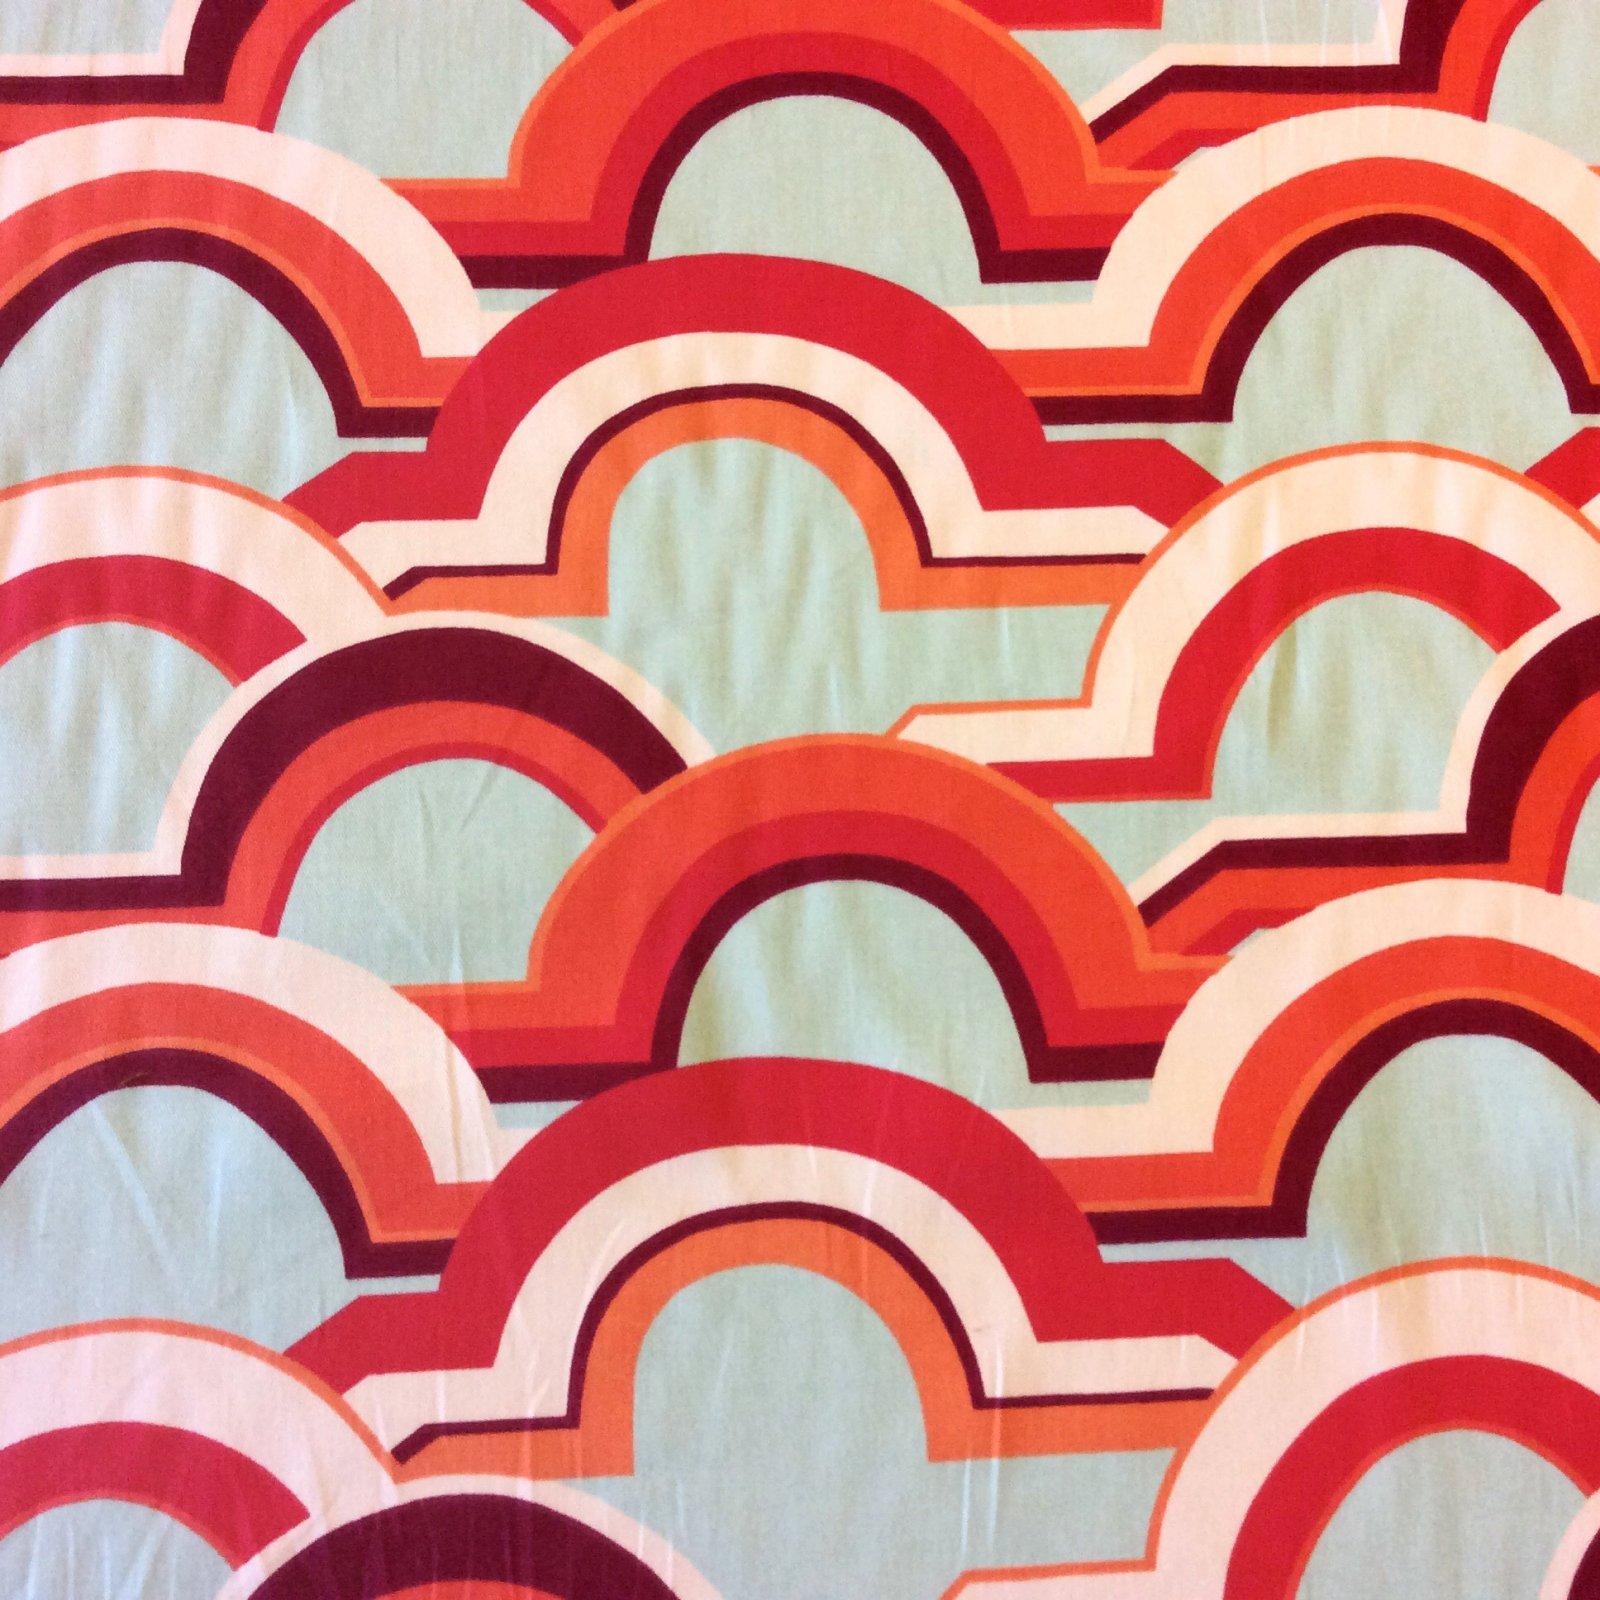 Eden Roc Retro Modern Geometric Arches Heavy Weight Cotton Drapery Fabric NL248